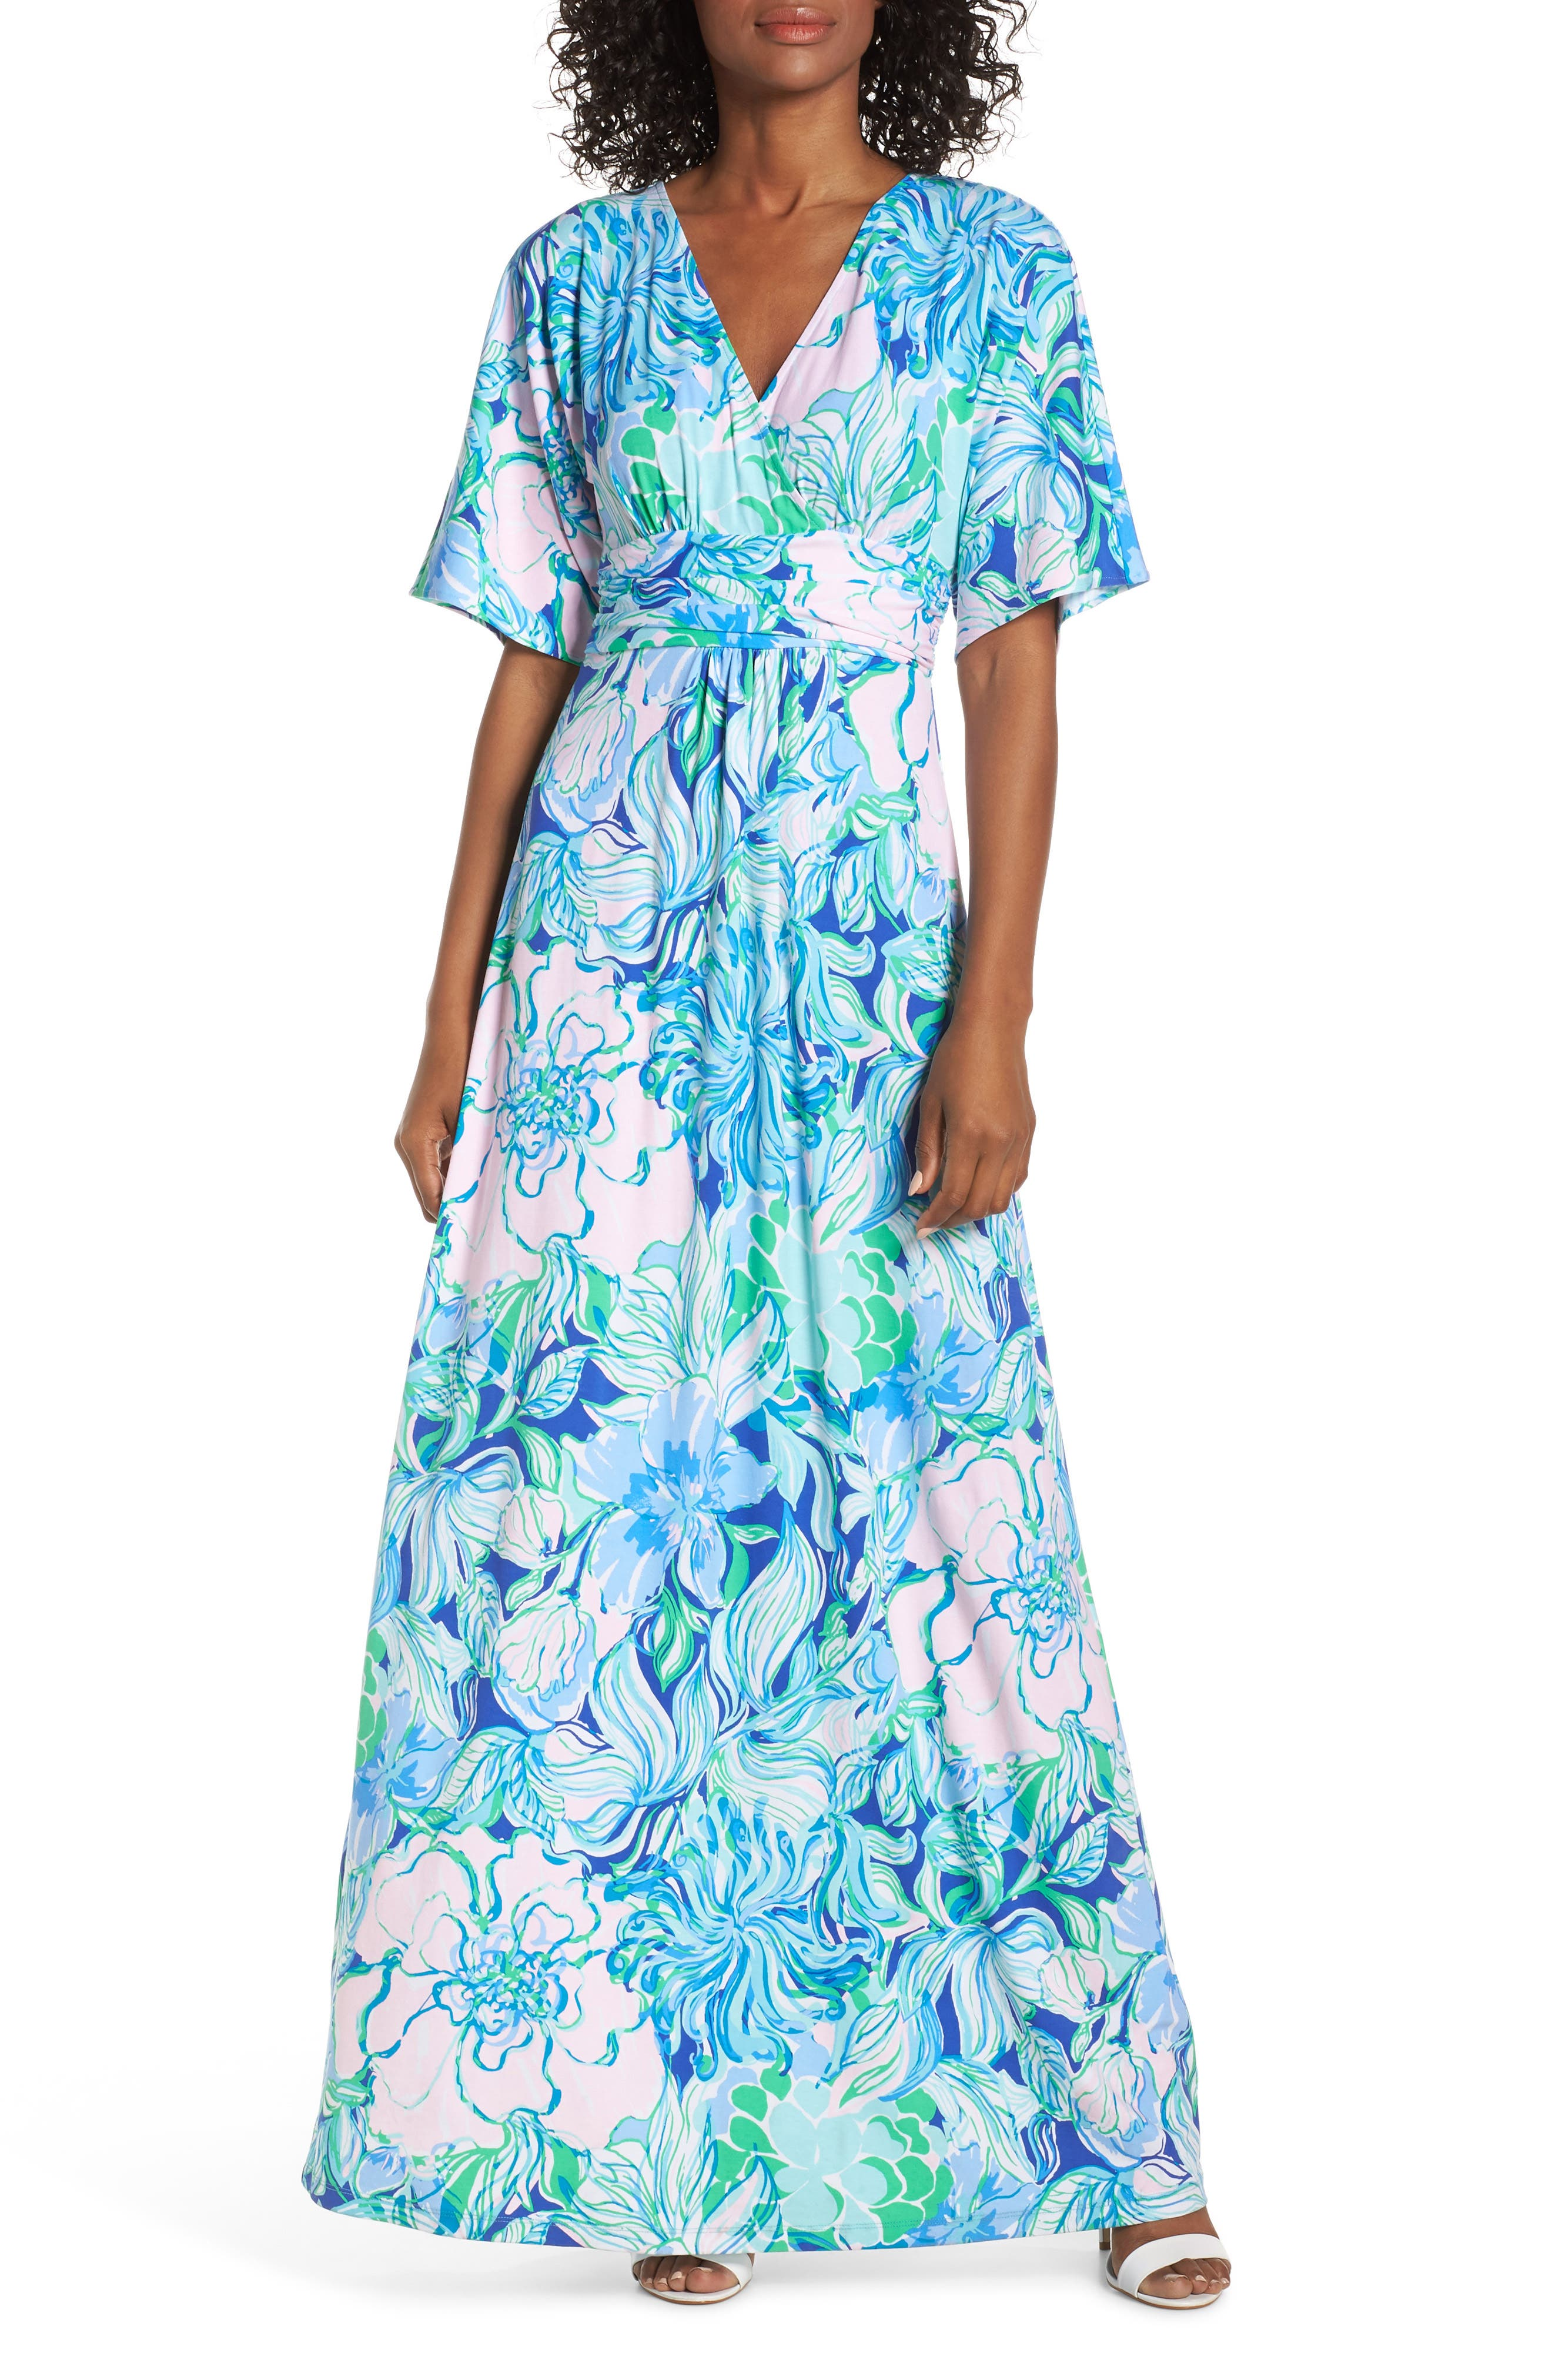 LILLY PULITZER<SUP>®</SUP>, Parigi Maxi Dress, Main thumbnail 1, color, MULTI PARTY THYME